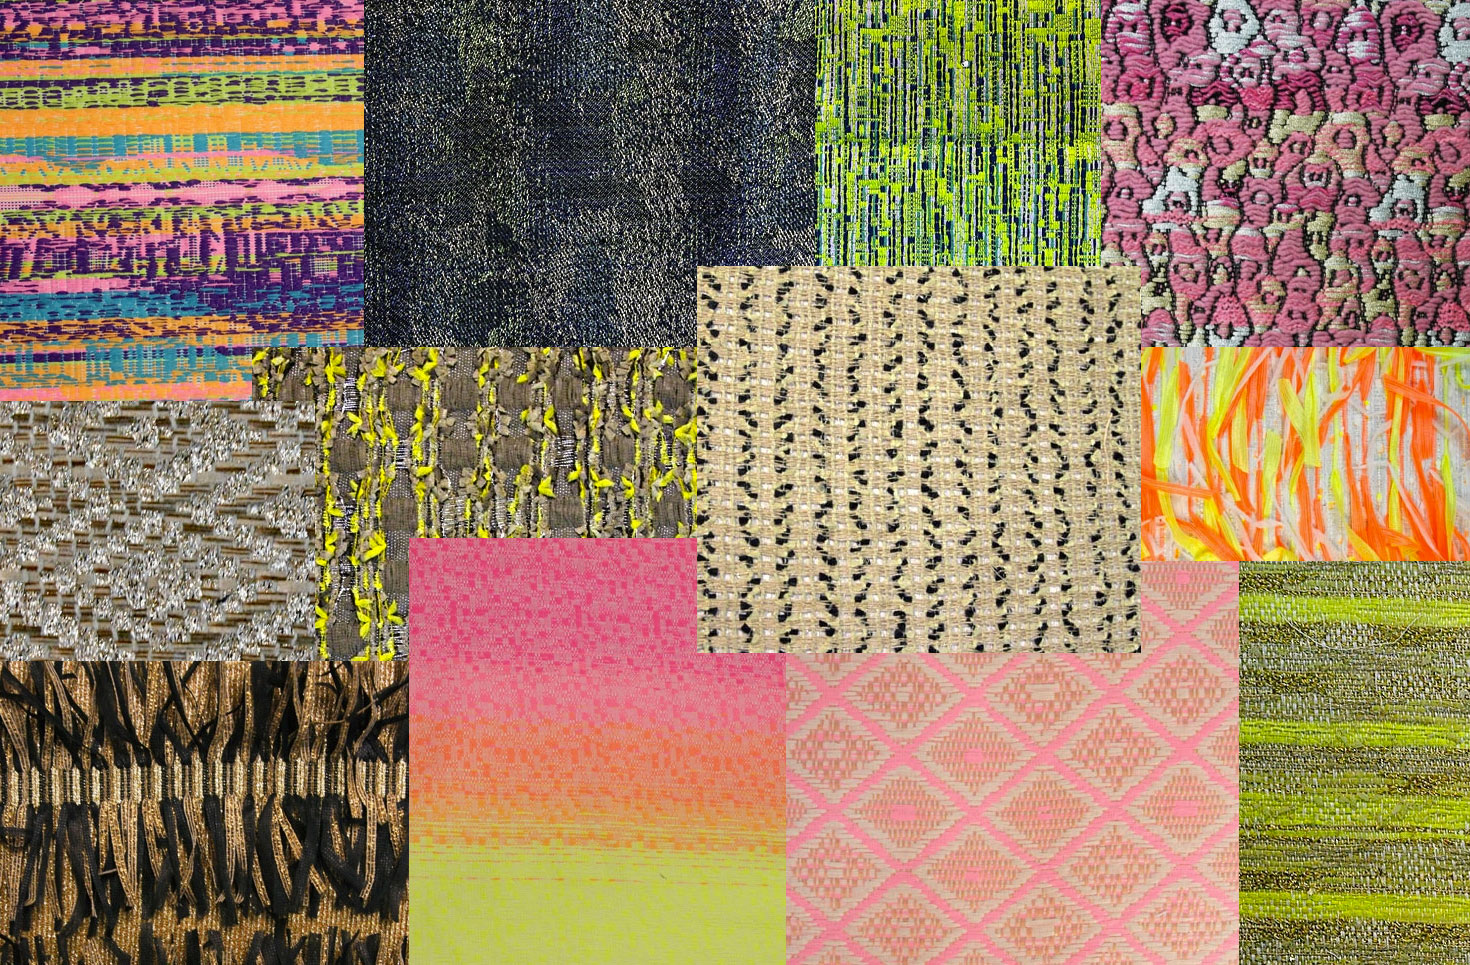 Malhia Kent woven fabrics. Collage by Liz Nehdi